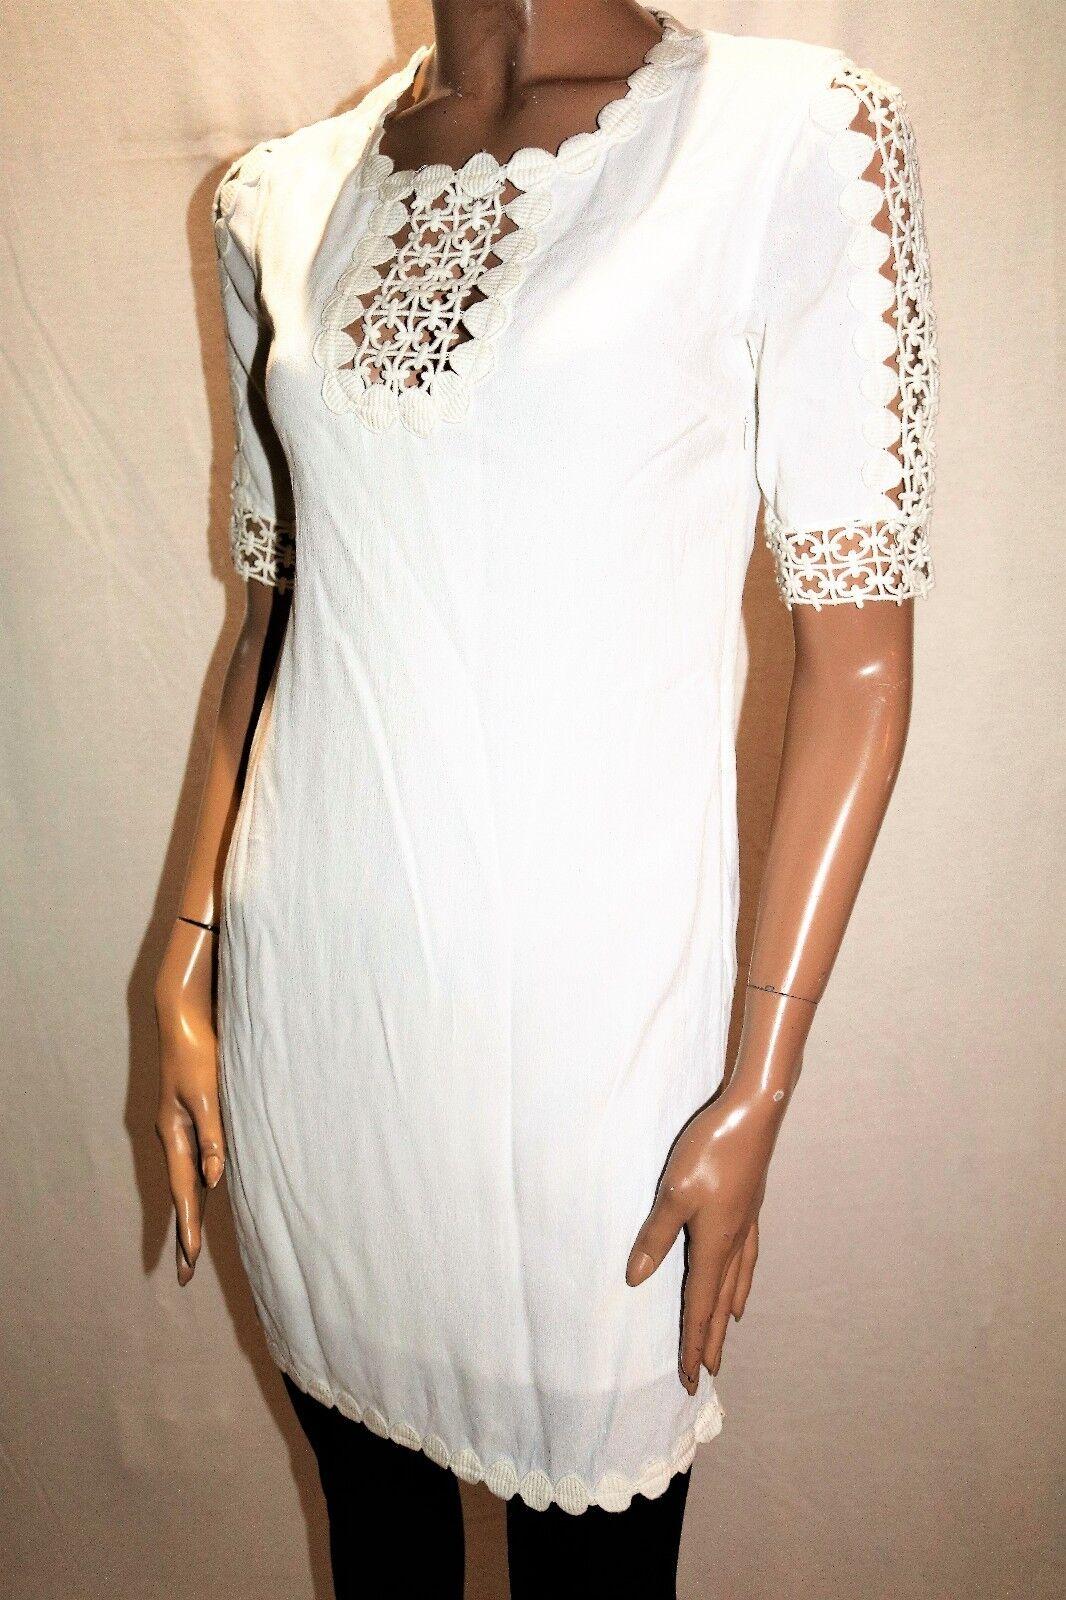 PICNIC Brand White Lace Piper Dress Size XS BNWT  HG14